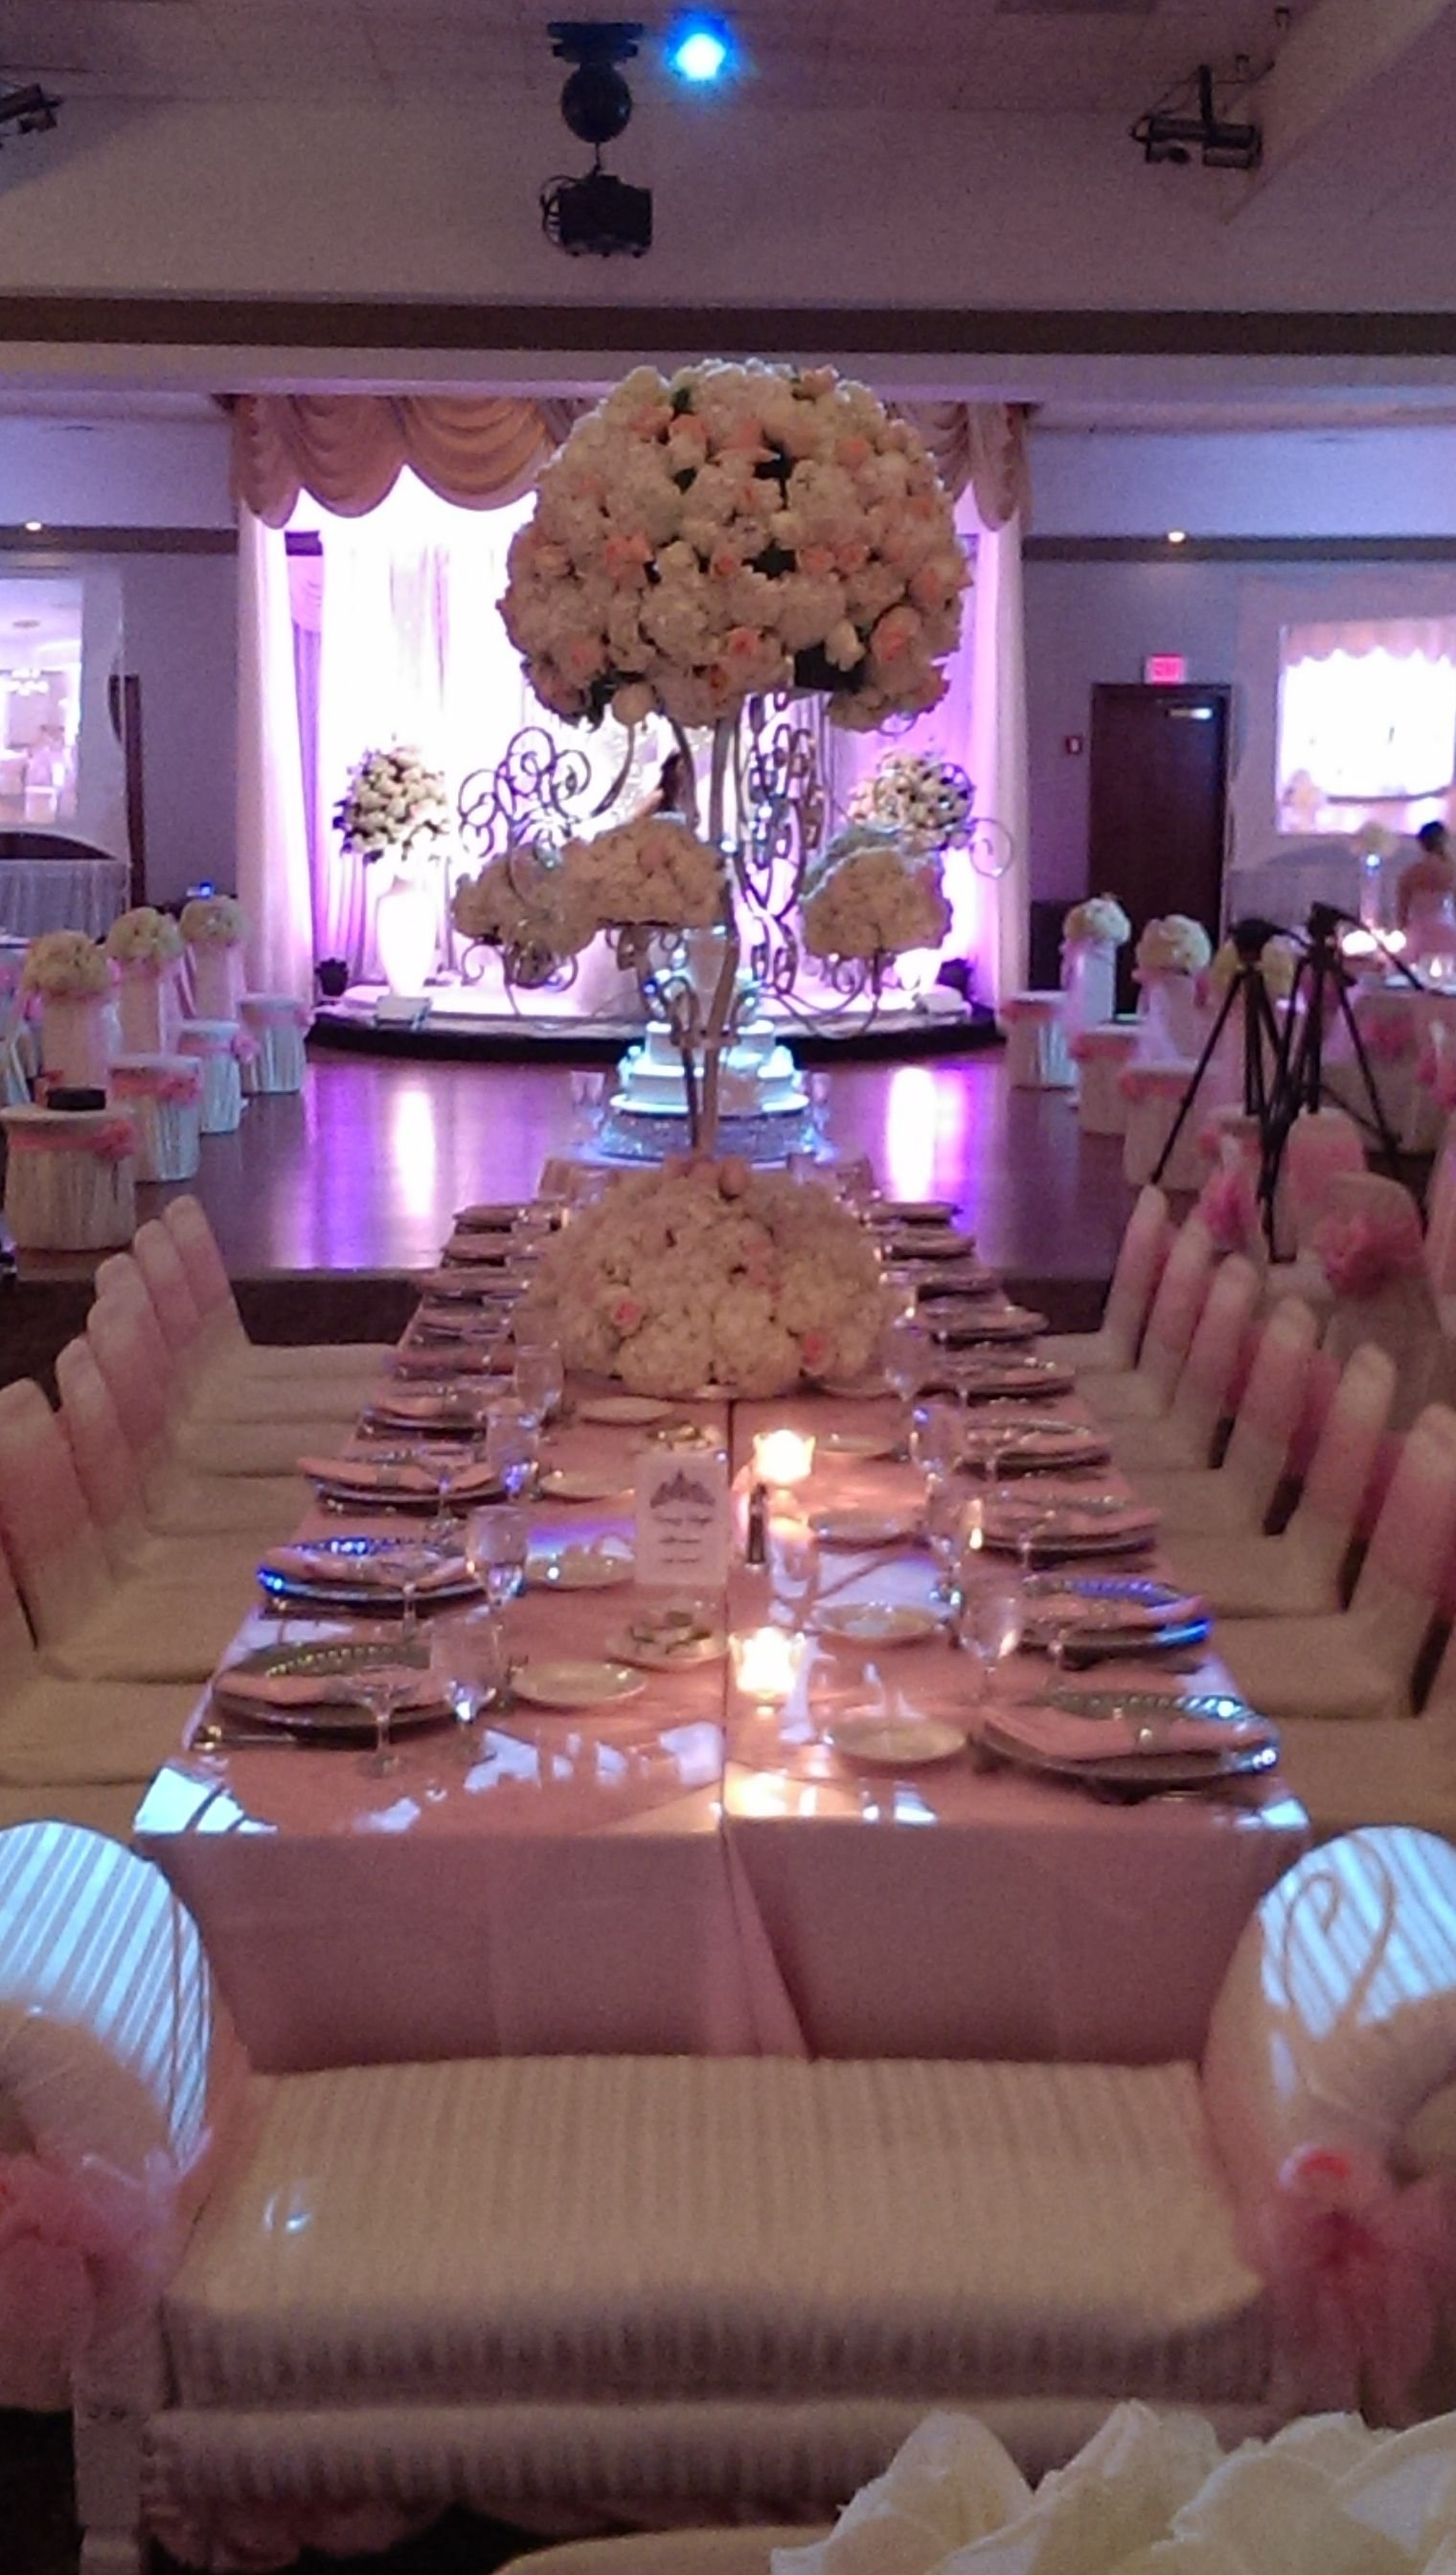 10 Amazing Sweet 16 Table Decoration Ideas a stylish sweet 16 table setup bookingentertainment sweet16 1 2020